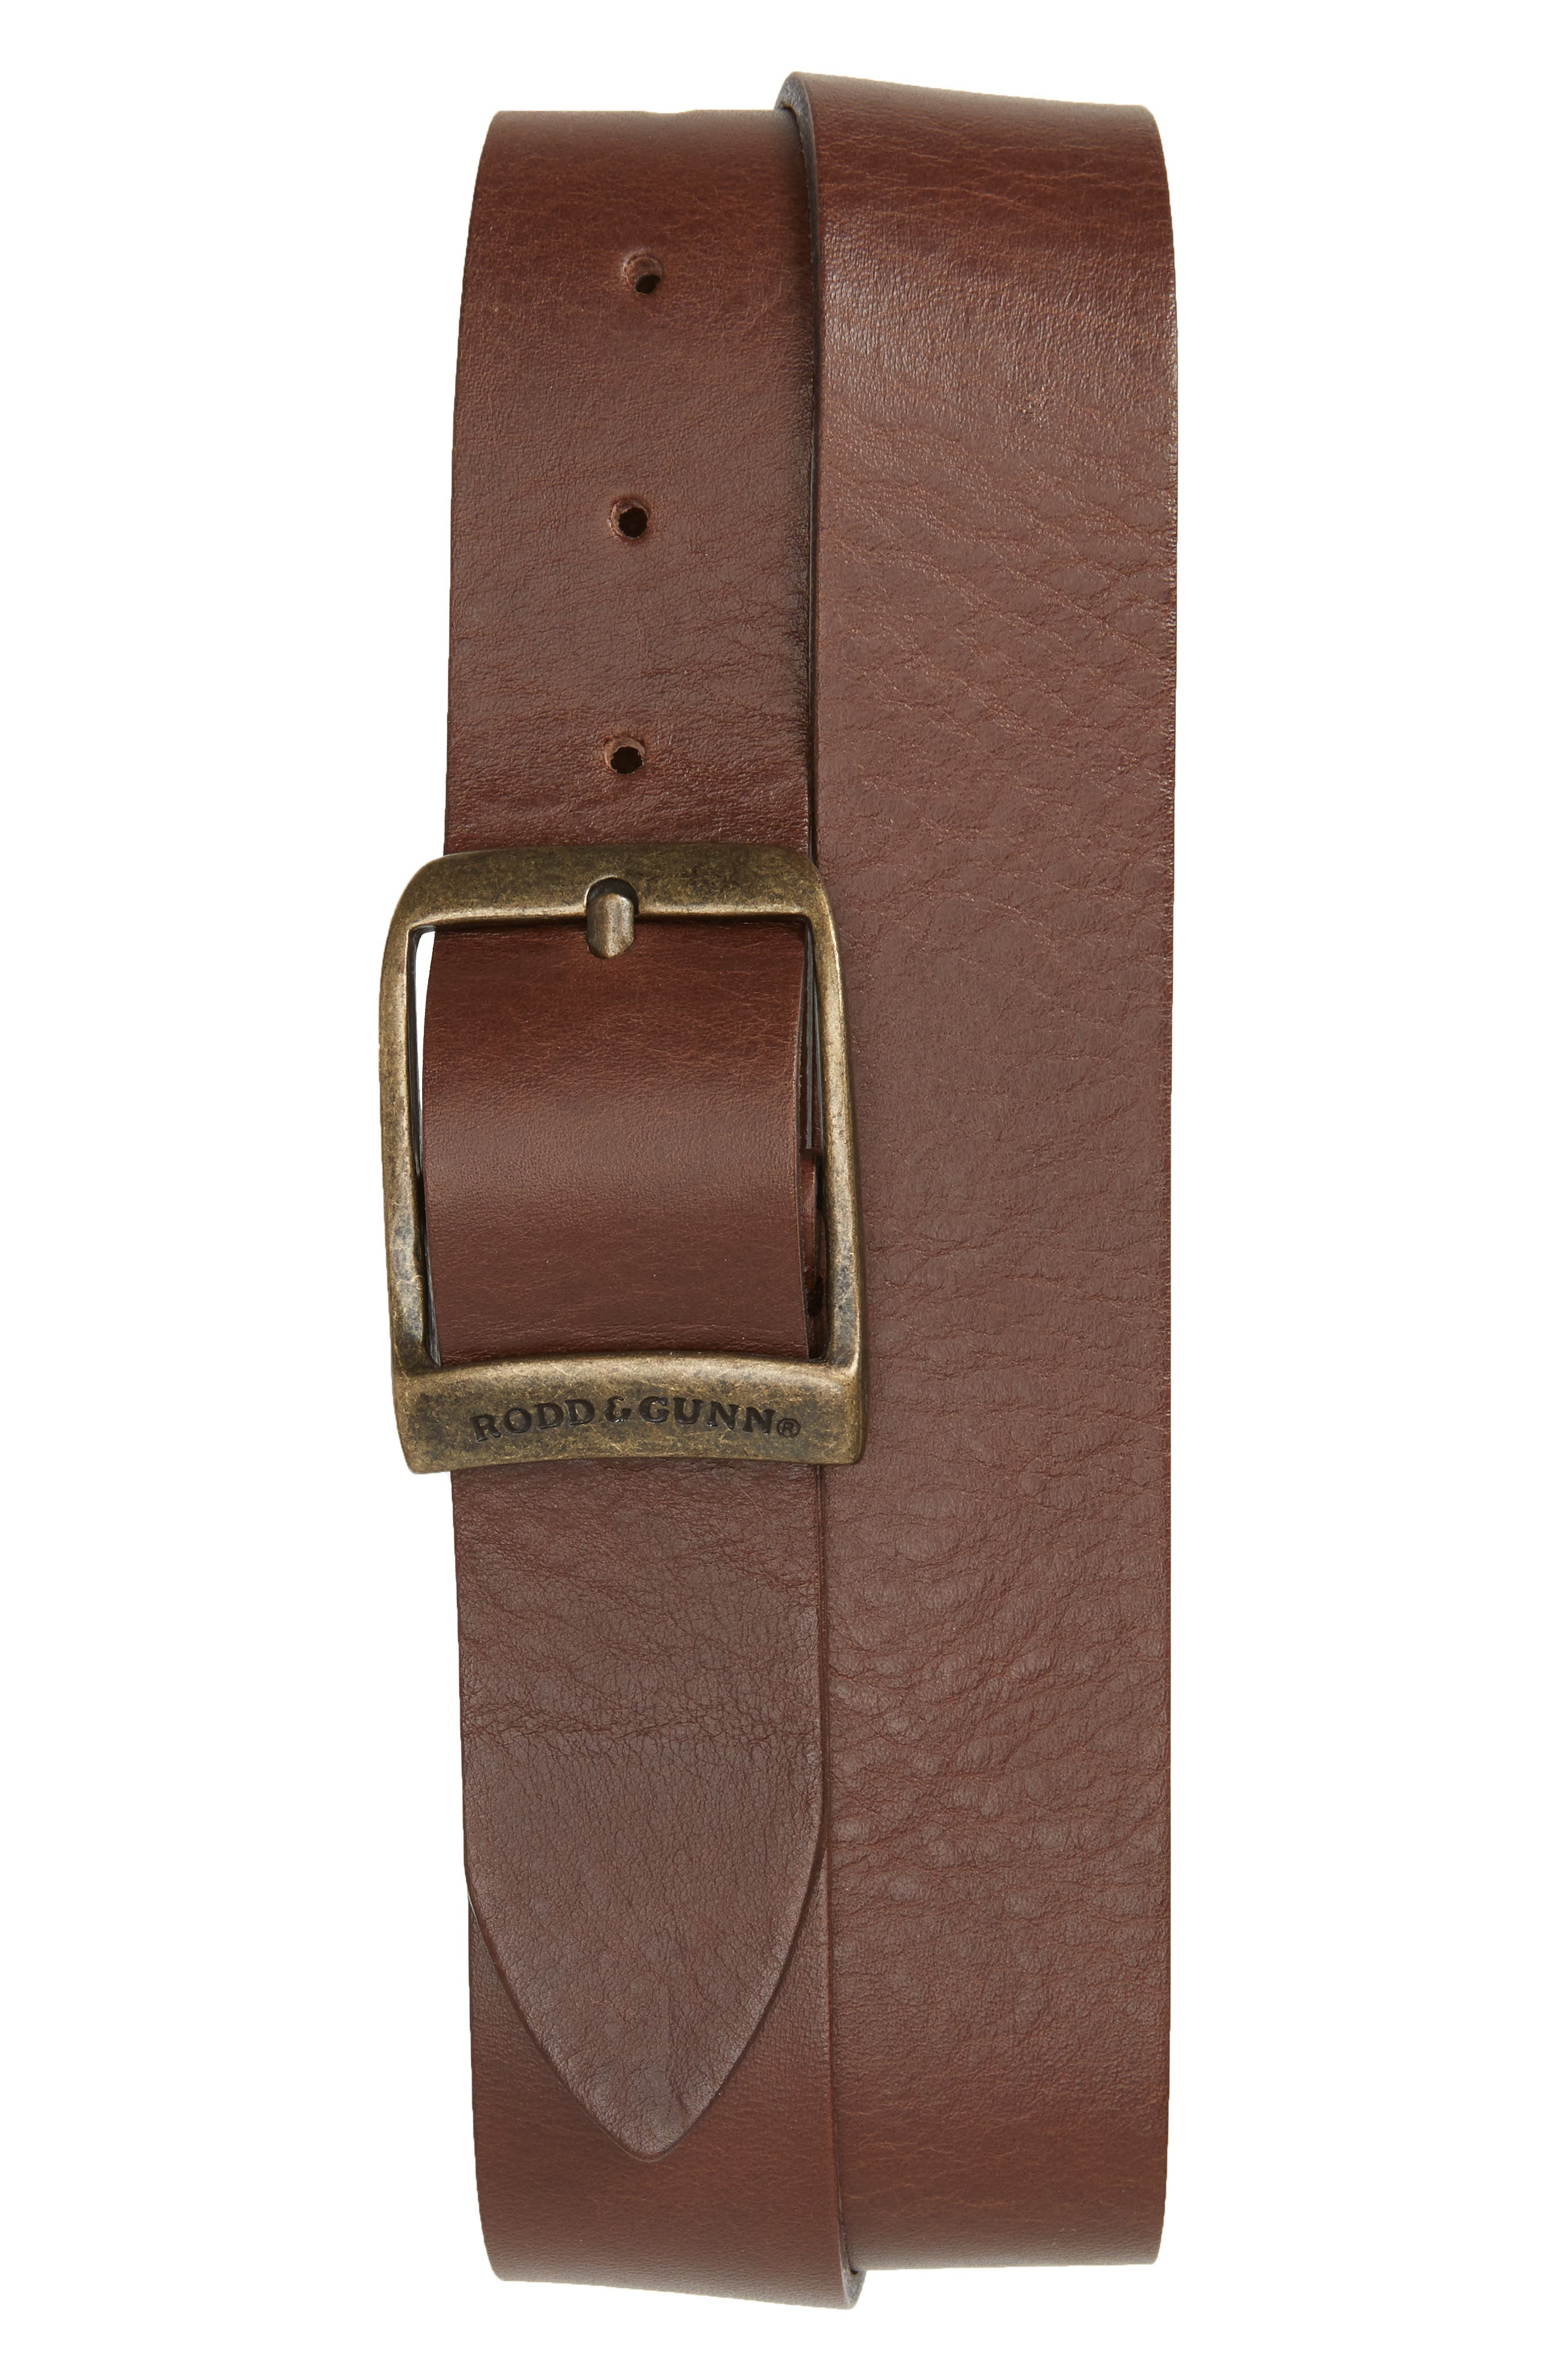 Rodd & Gunn Cornonet Crescent Leather Belt, Mud